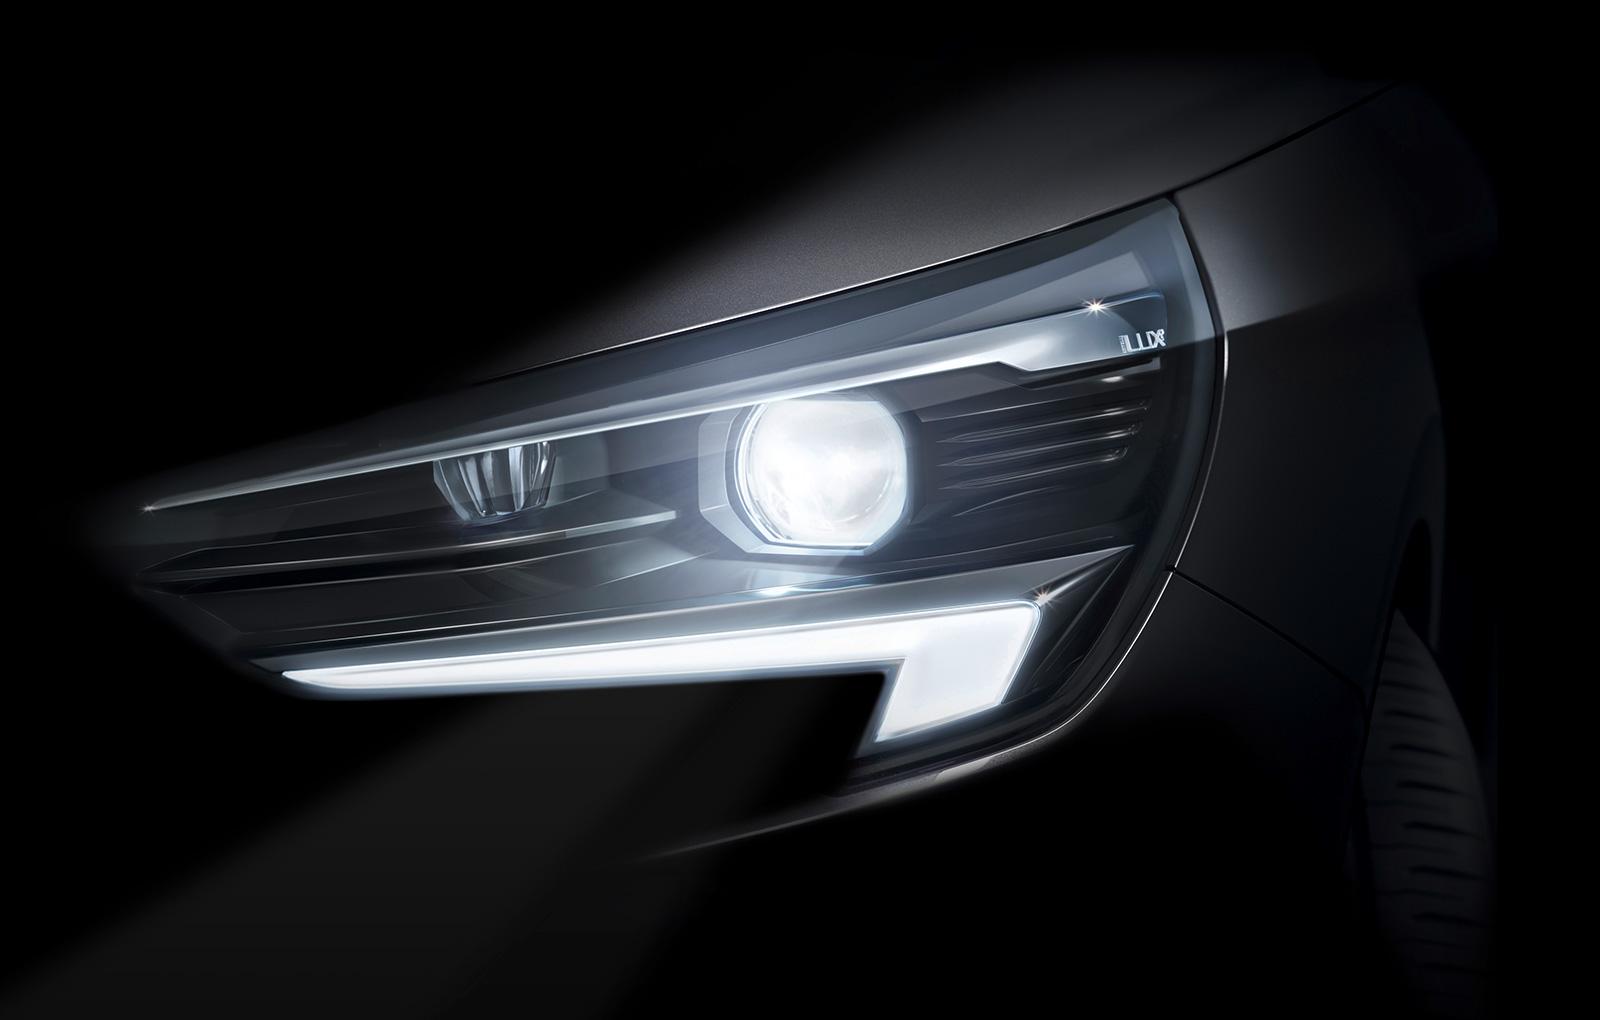 2020 Opel Corsa F Teased With IntelliLux LED Matrix Headlights